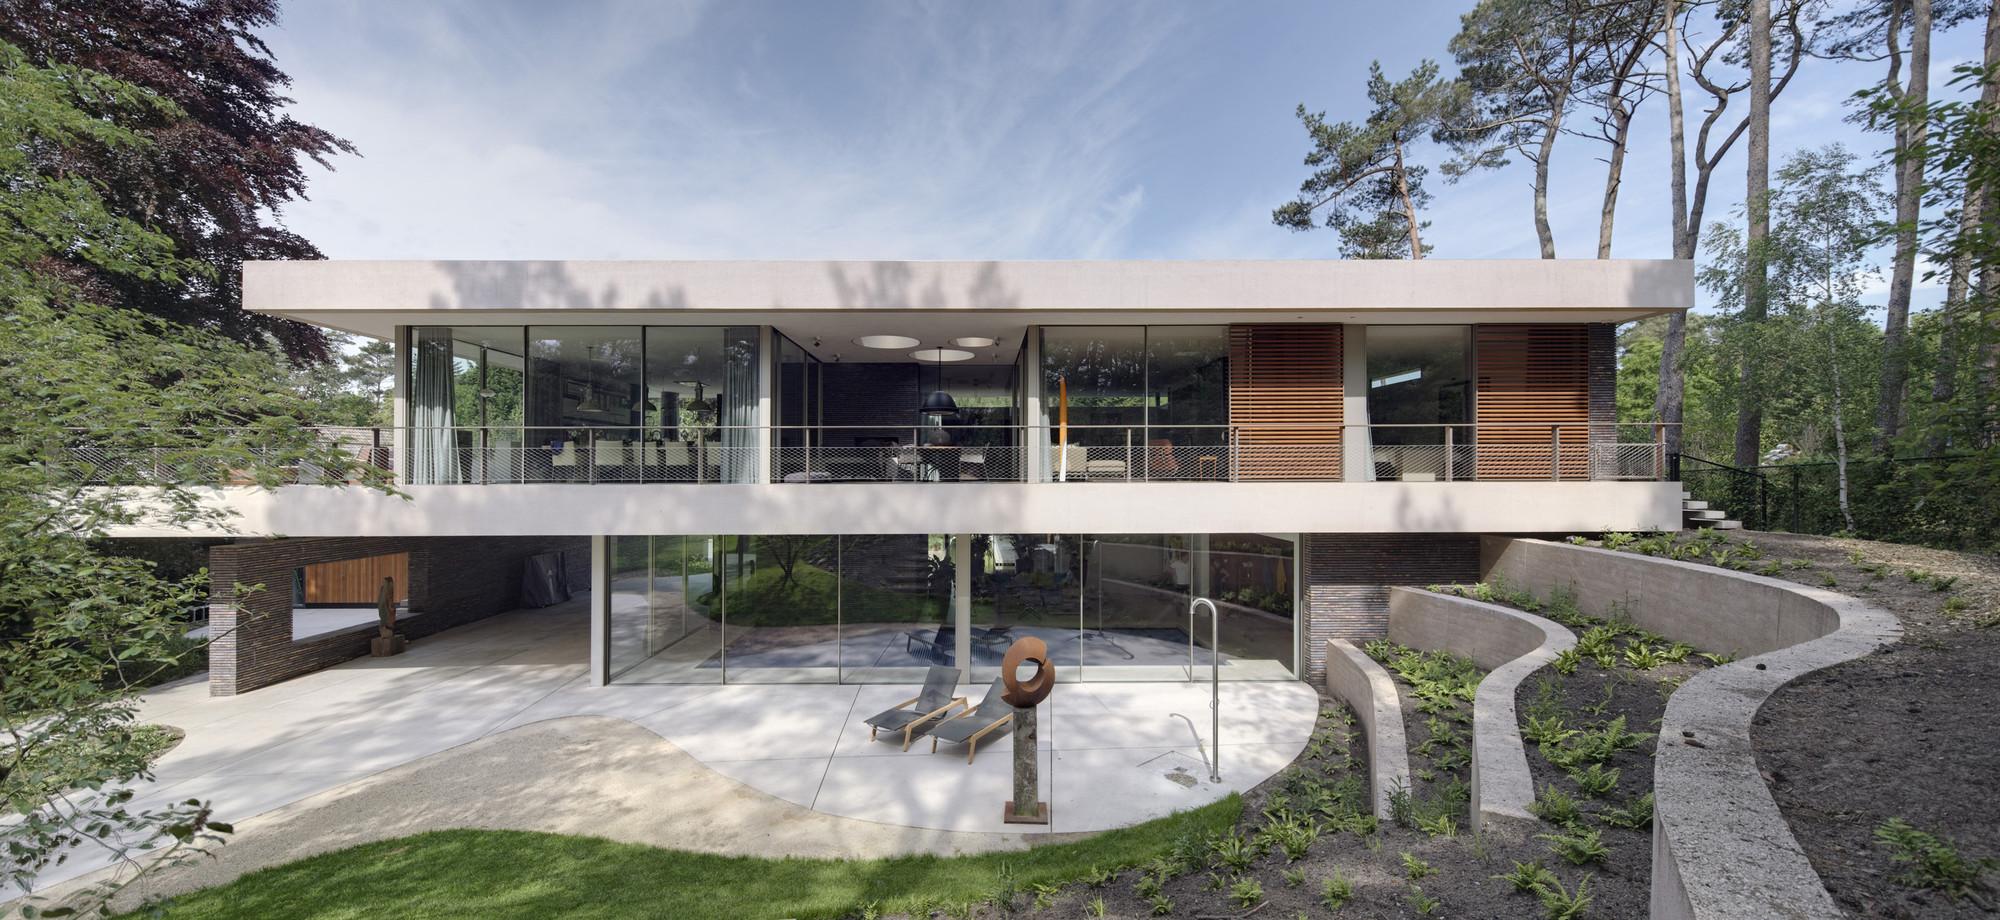 Dune villa hilberinkbosch architects archdaily